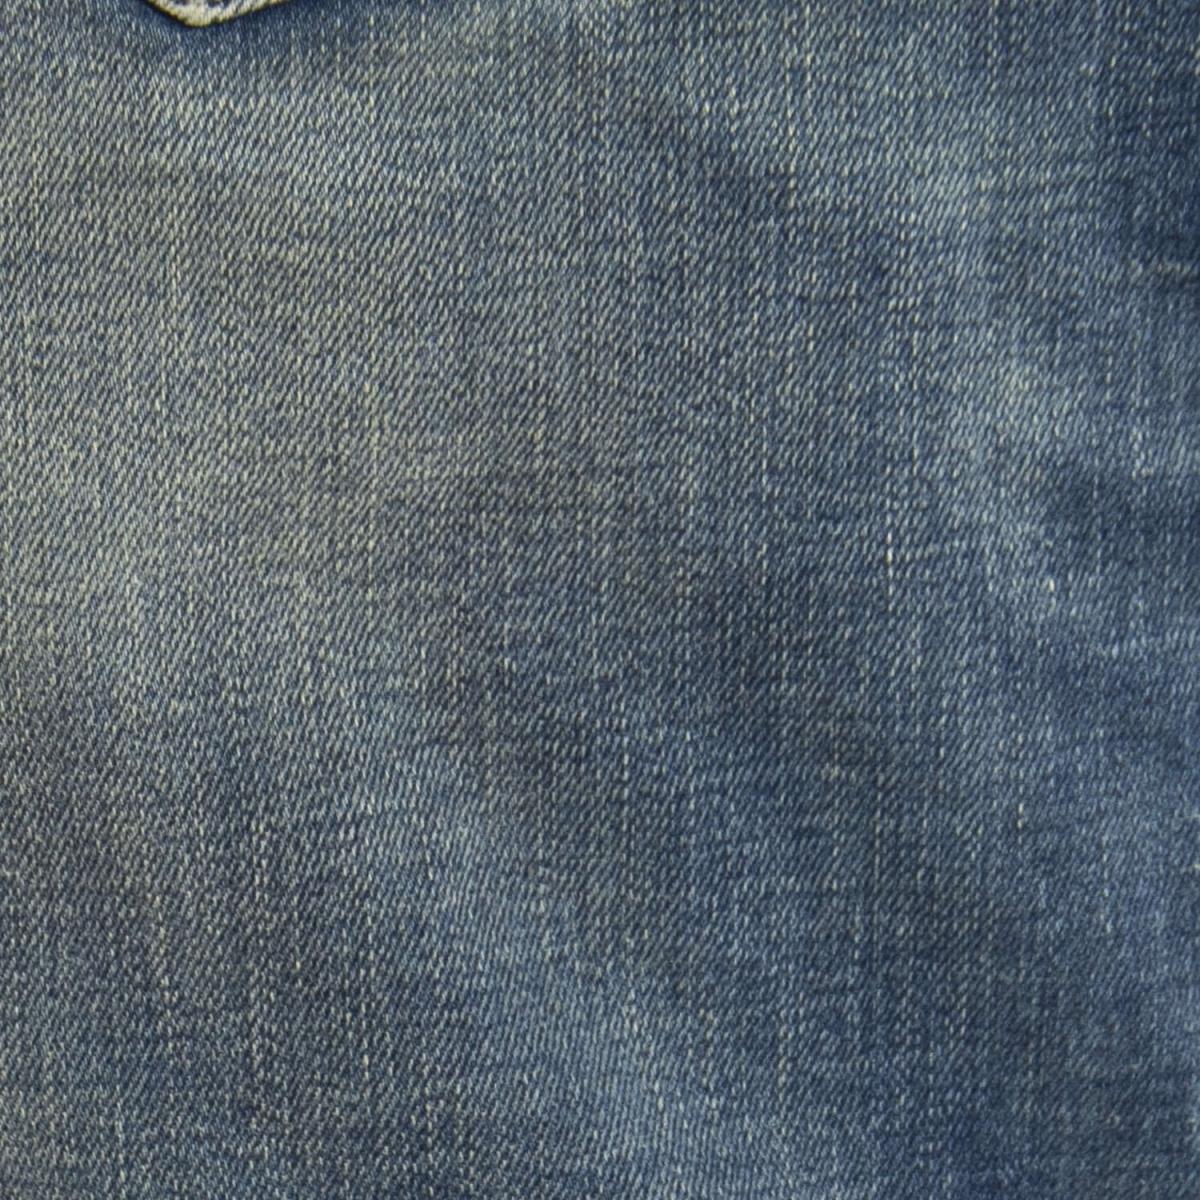 abbigliamento Jeans uomo Jeans slim fit GL078F GIANNI LUPO Cafedelmar Shop